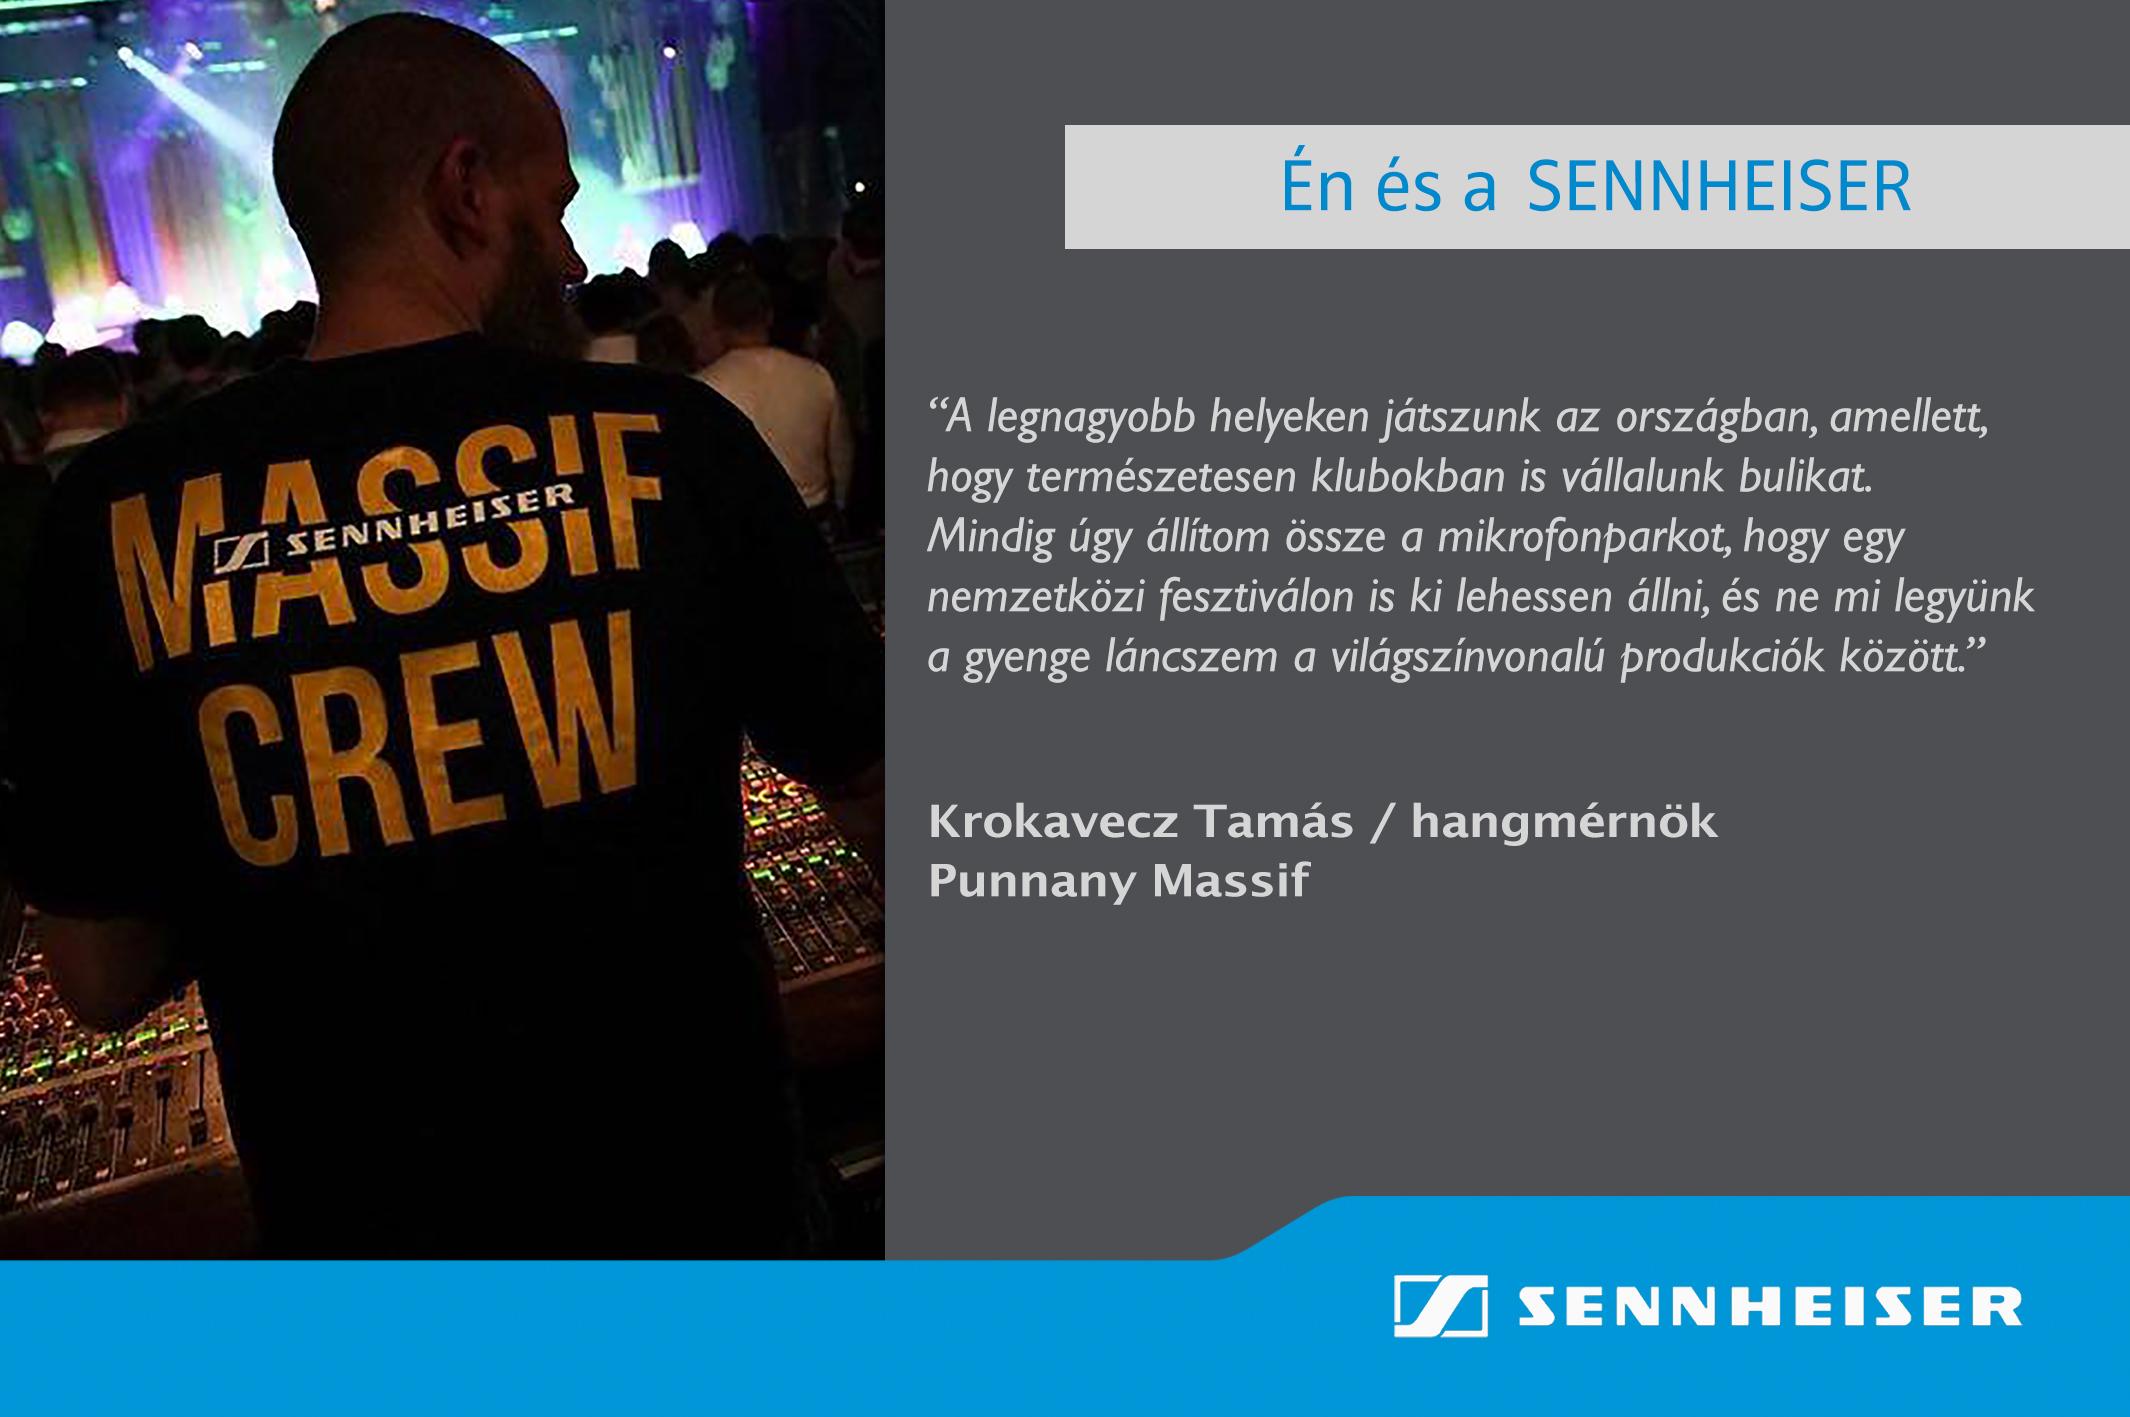 en_es_a_sennheiser_v_6_b.jpg